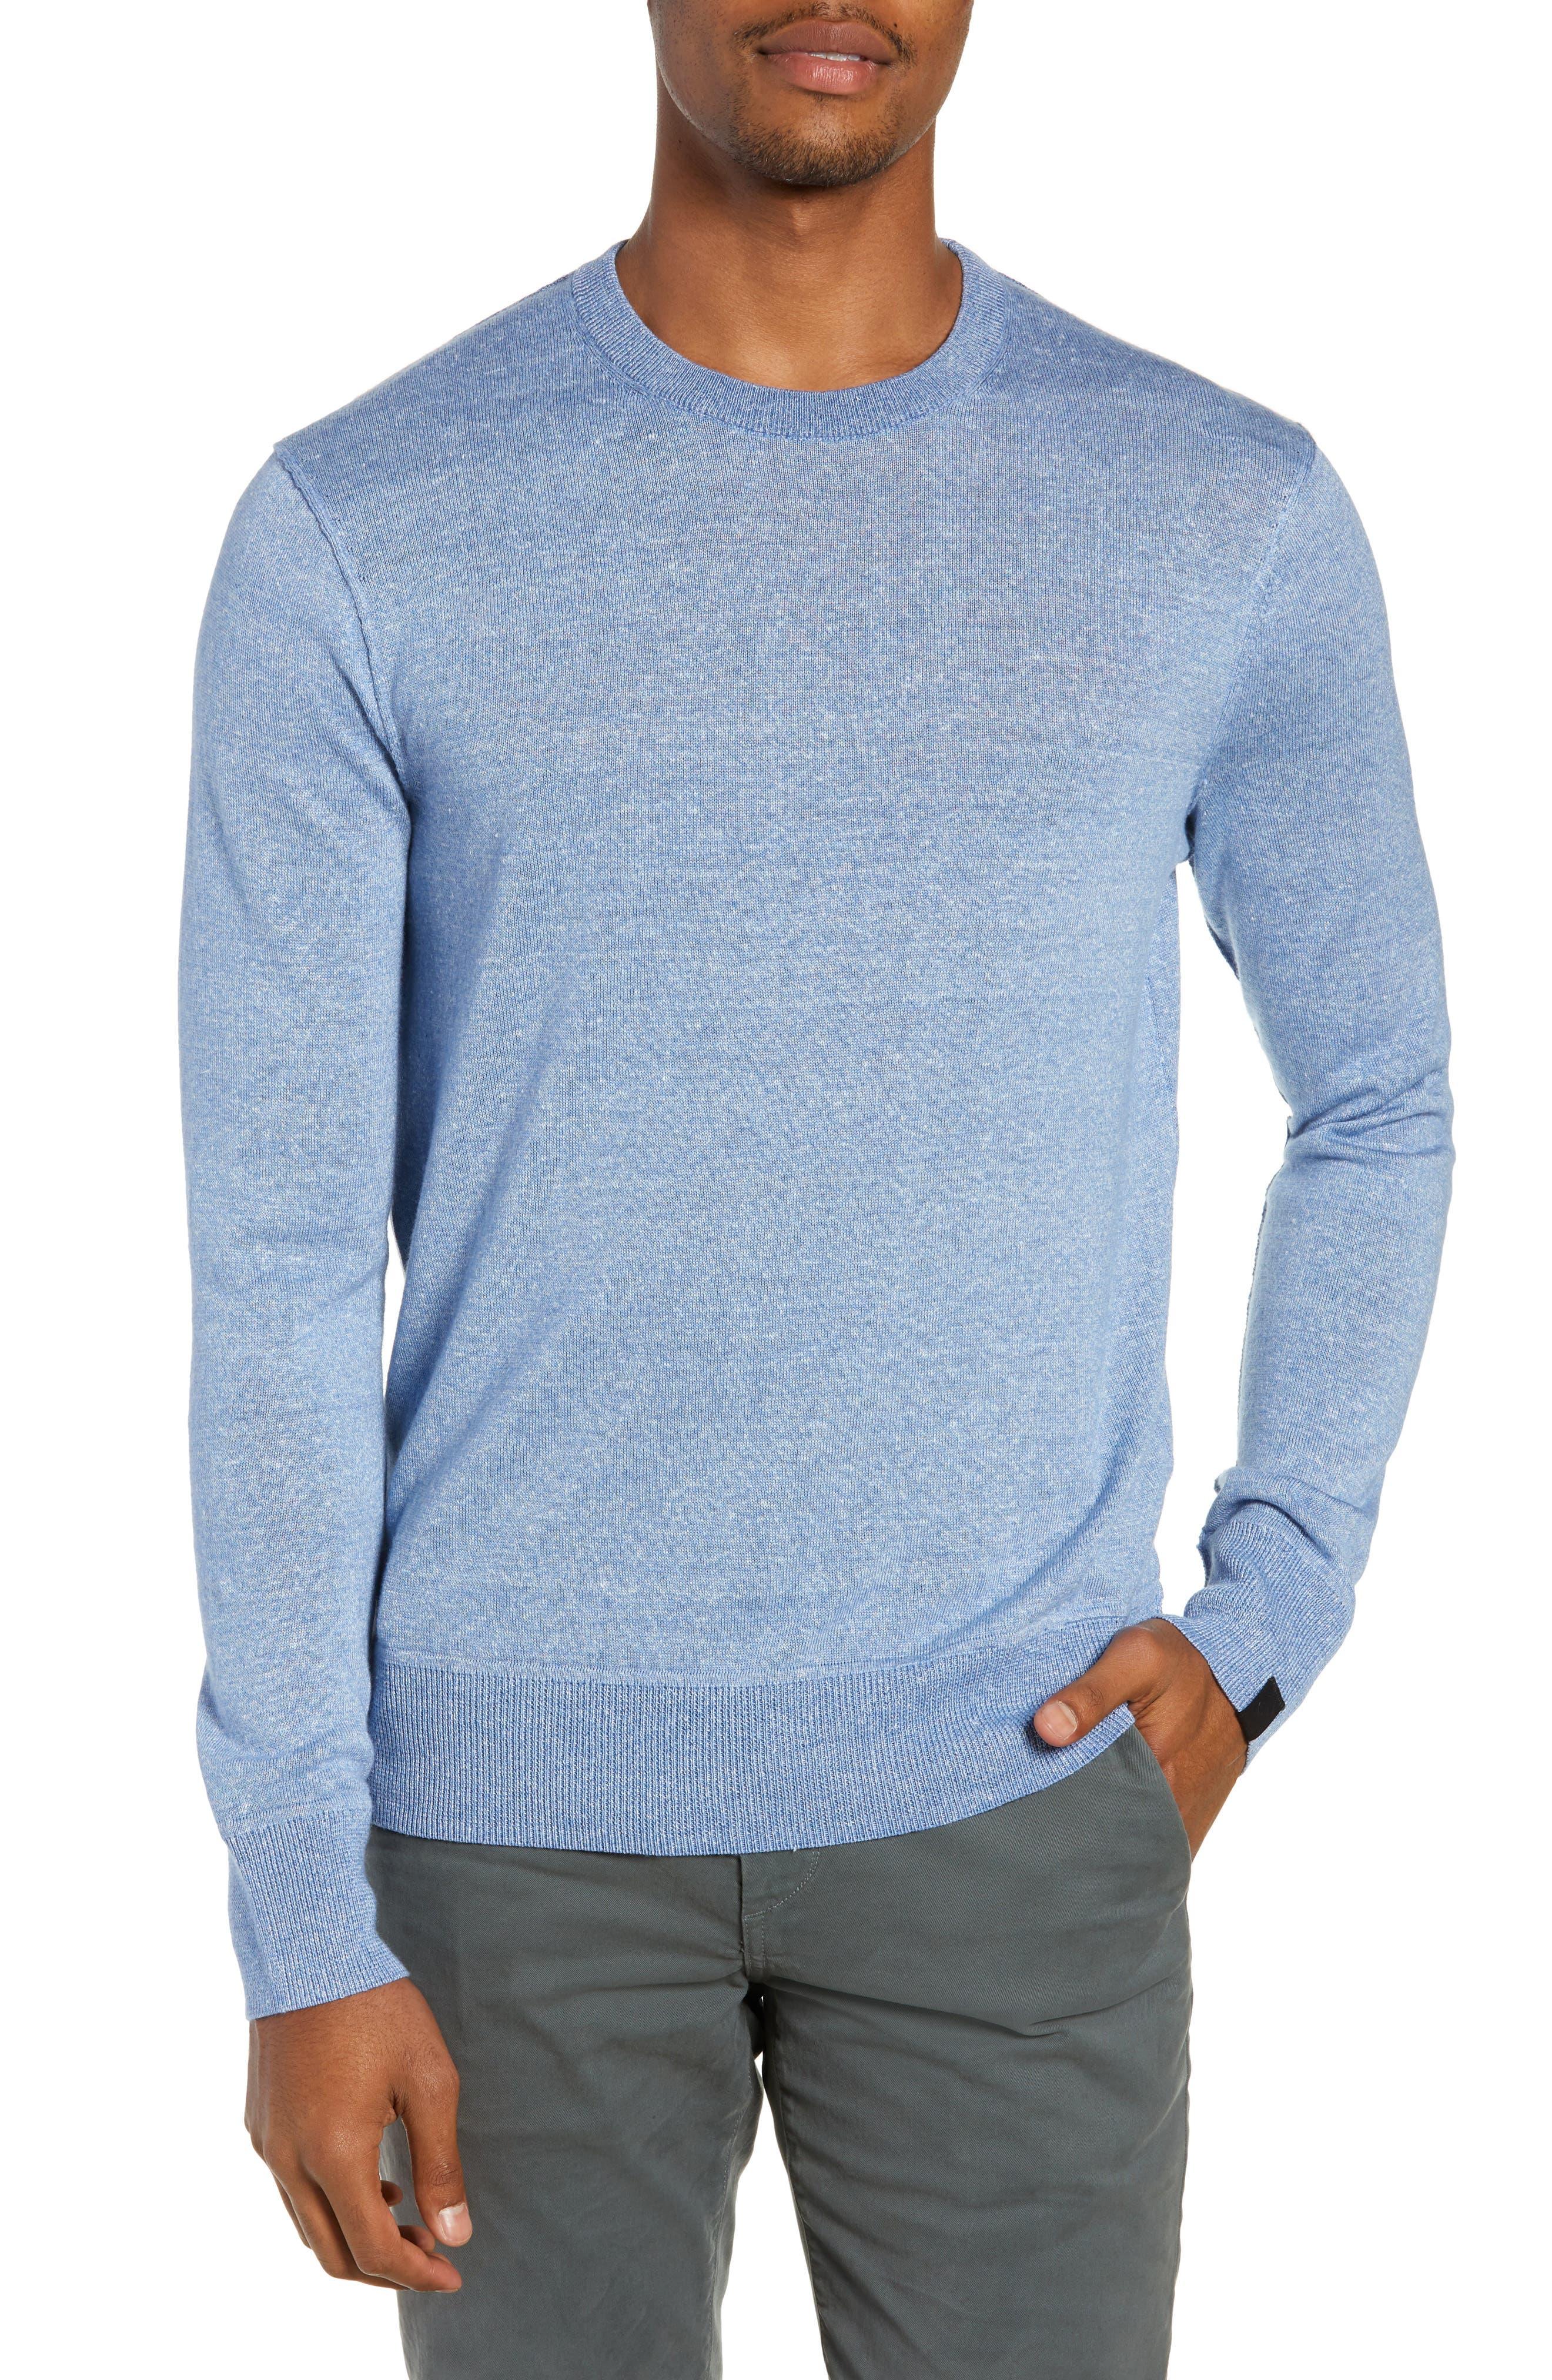 Men'S Dean Merino/Linen Crewneck Sweater in Light Blue